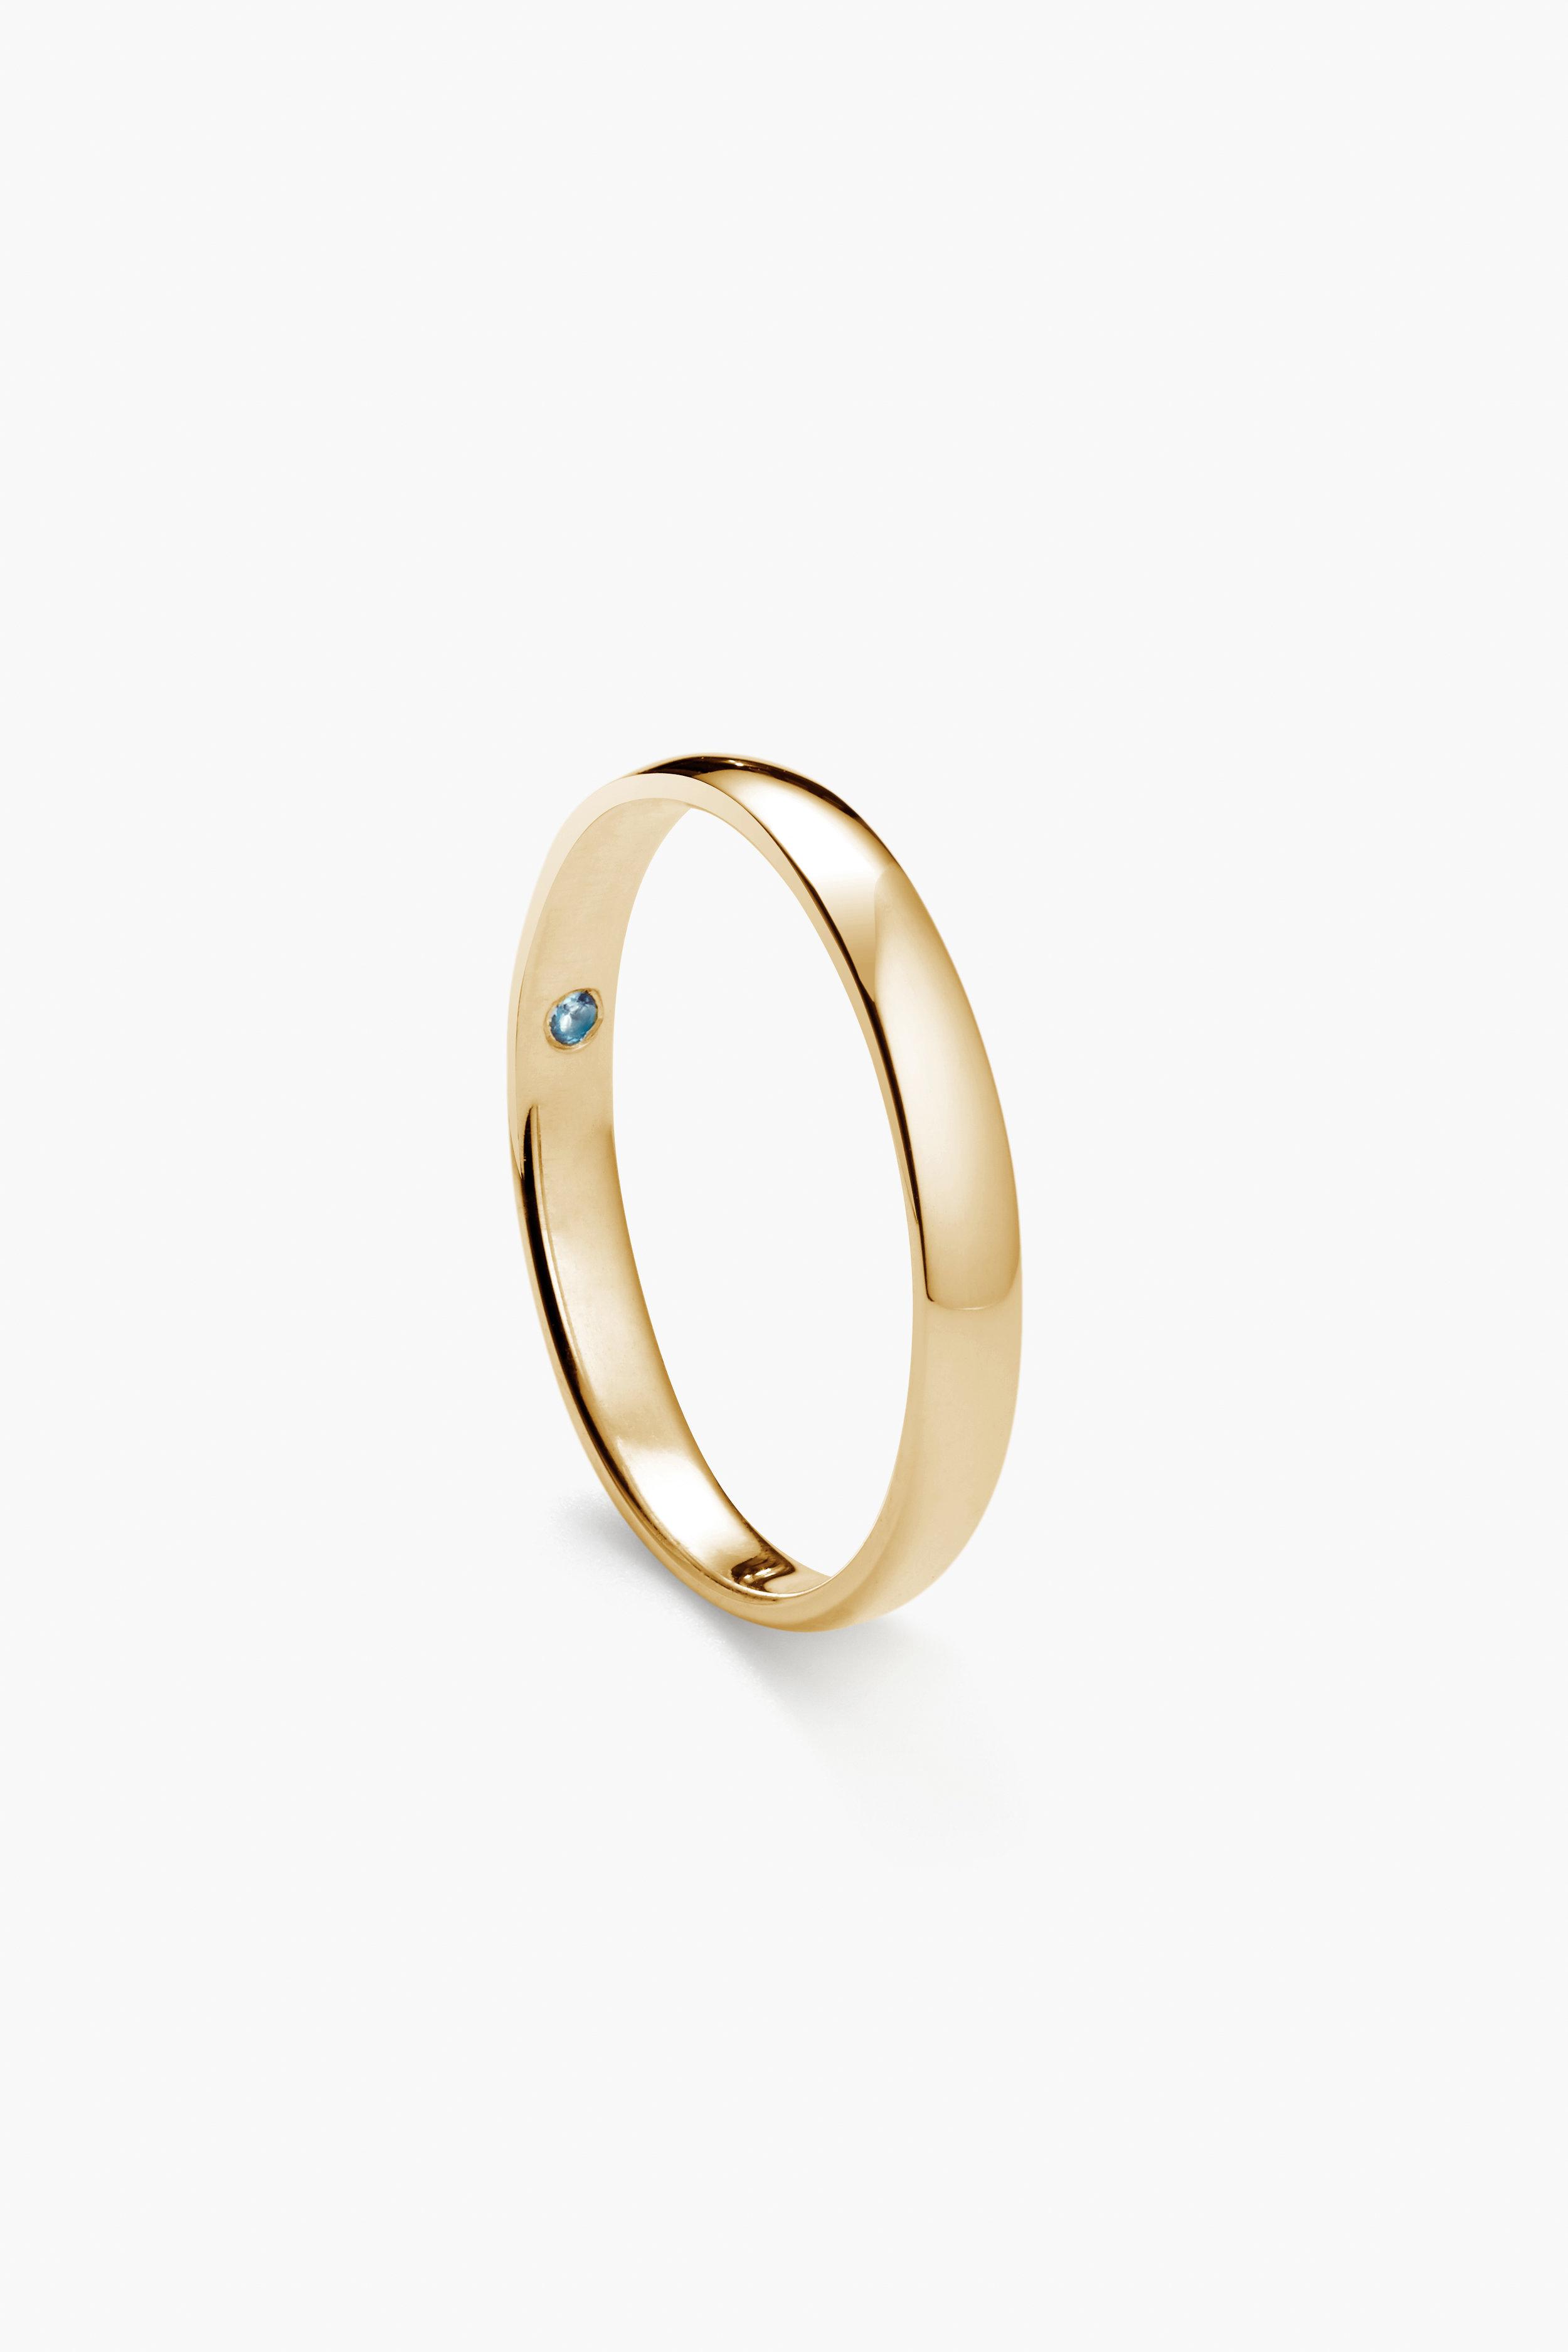 Ring_05-Gold.jpg